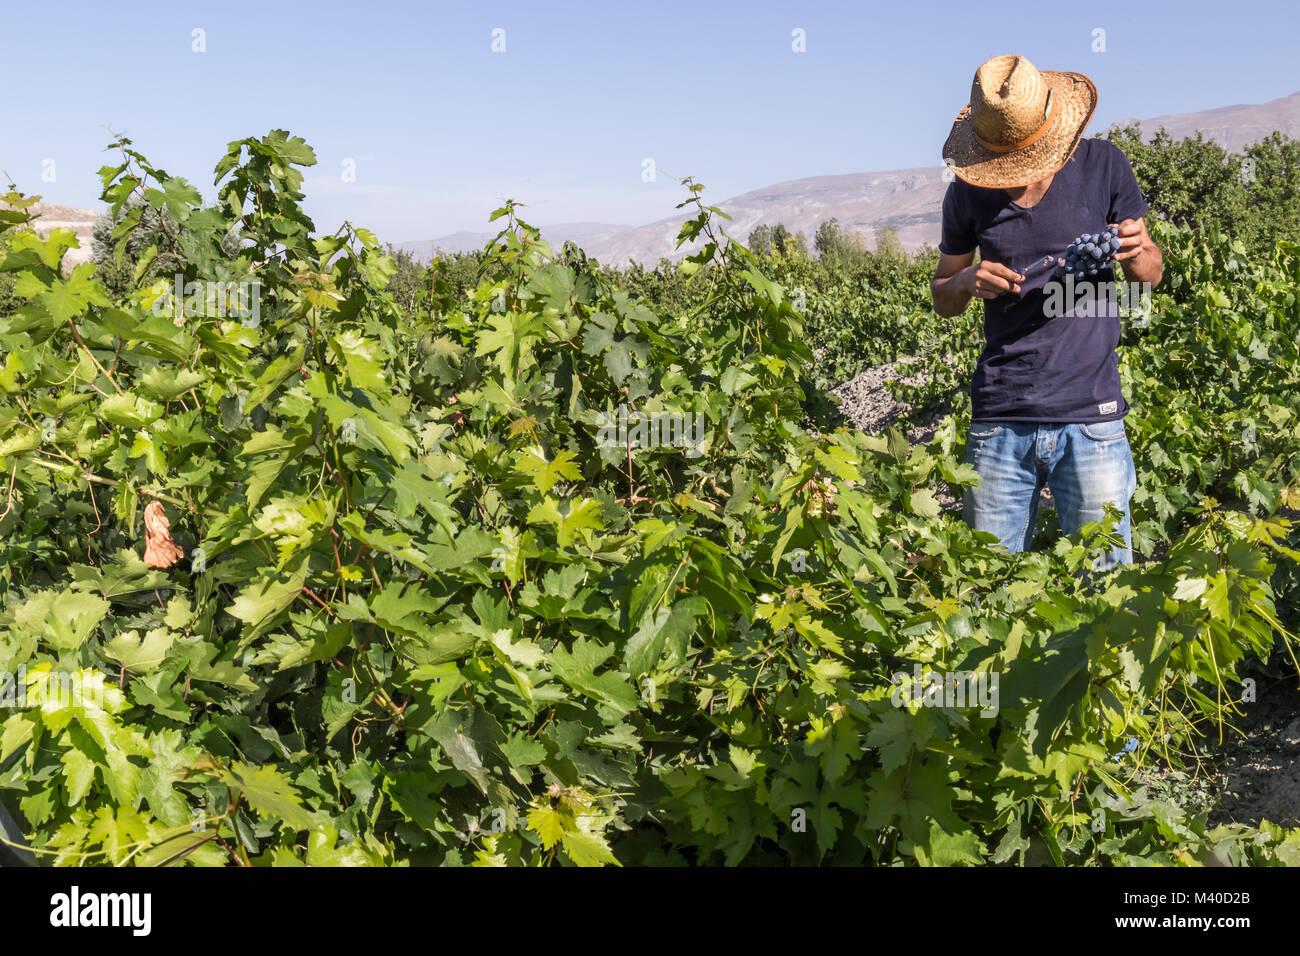 Unidentified man cuts bunch of grapes in vineyard.Uzumlu,Erzincan,Turkey.07 September 2014 - Stock Image